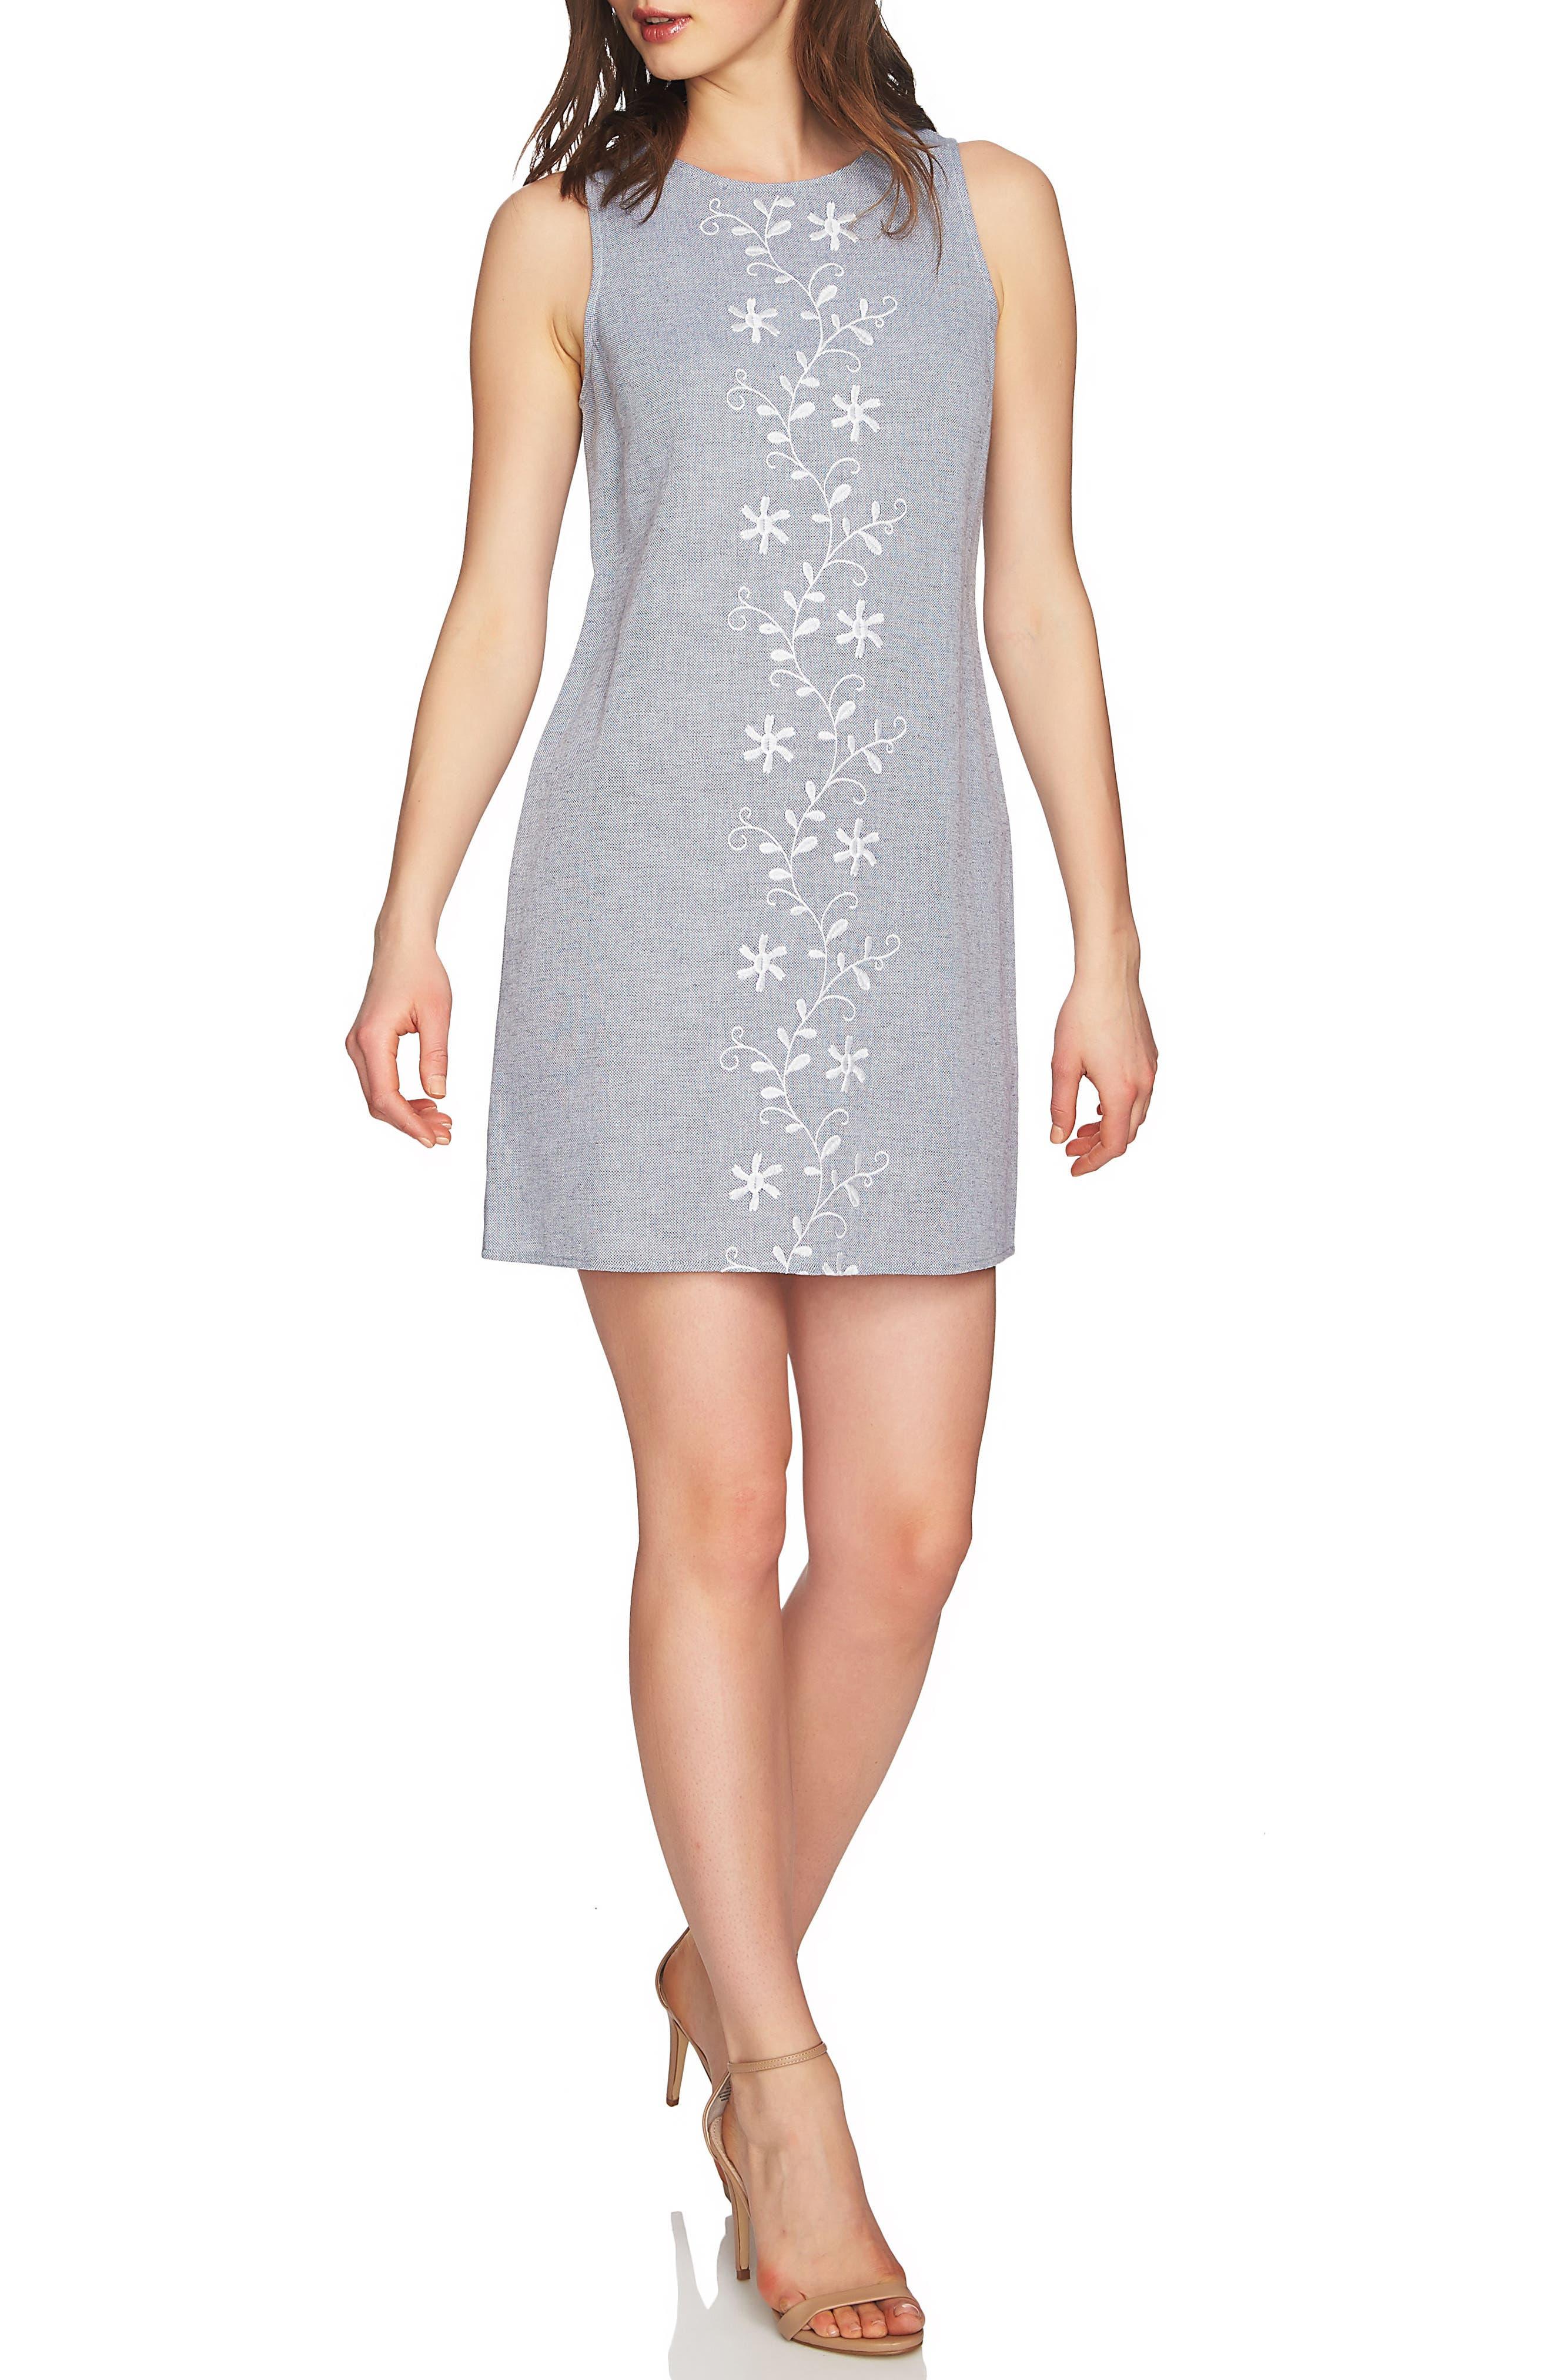 Arlington Sleeveless Embroidered Shift Dress,                             Main thumbnail 1, color,                             420